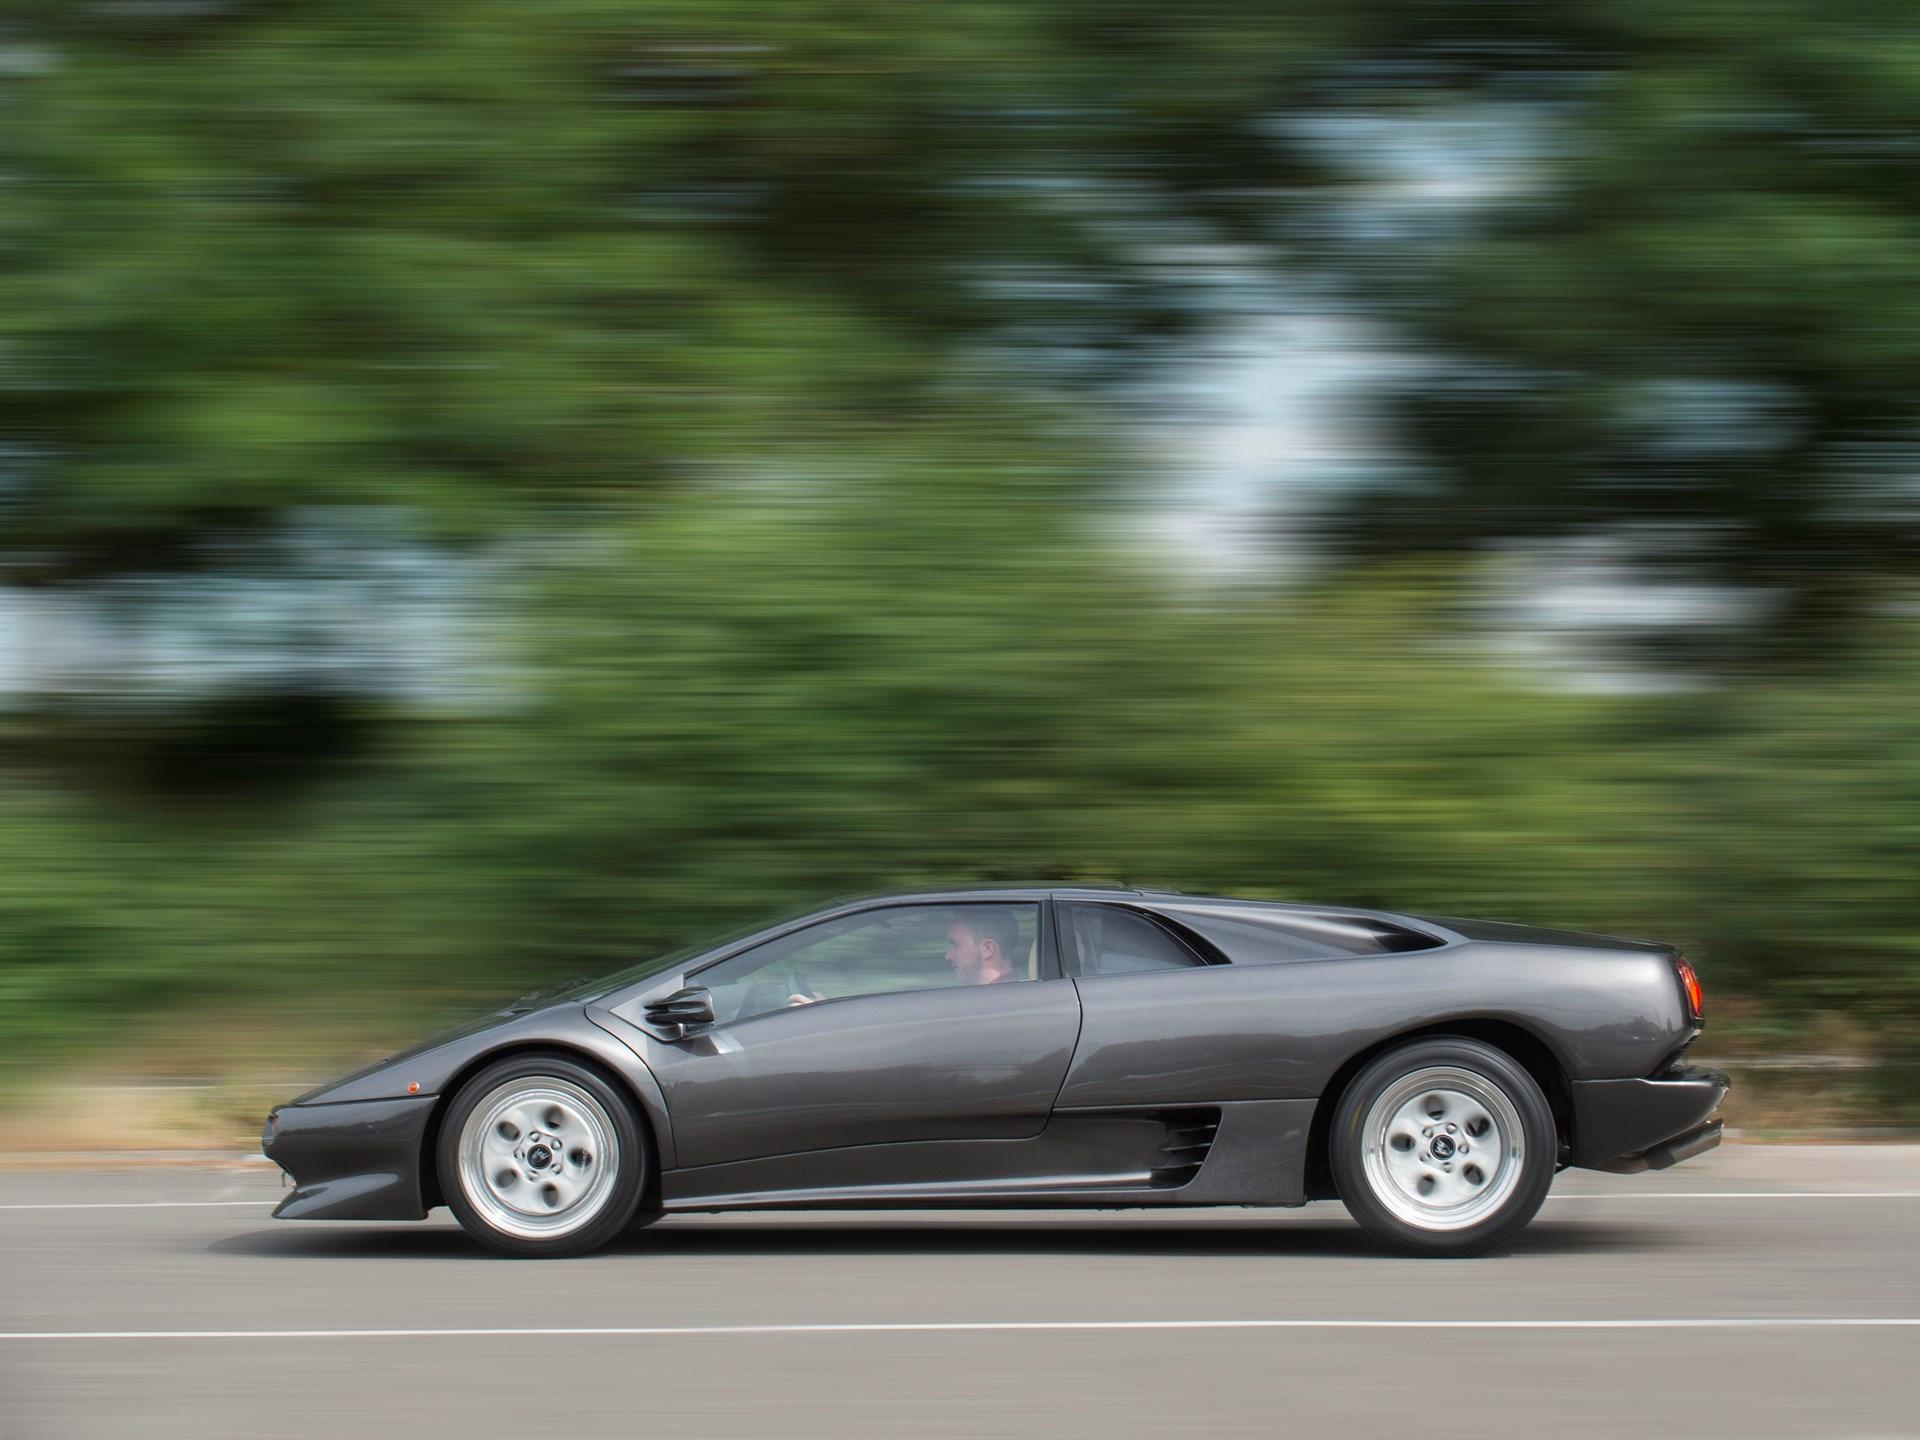 1993 Lamborghini Diablo VT